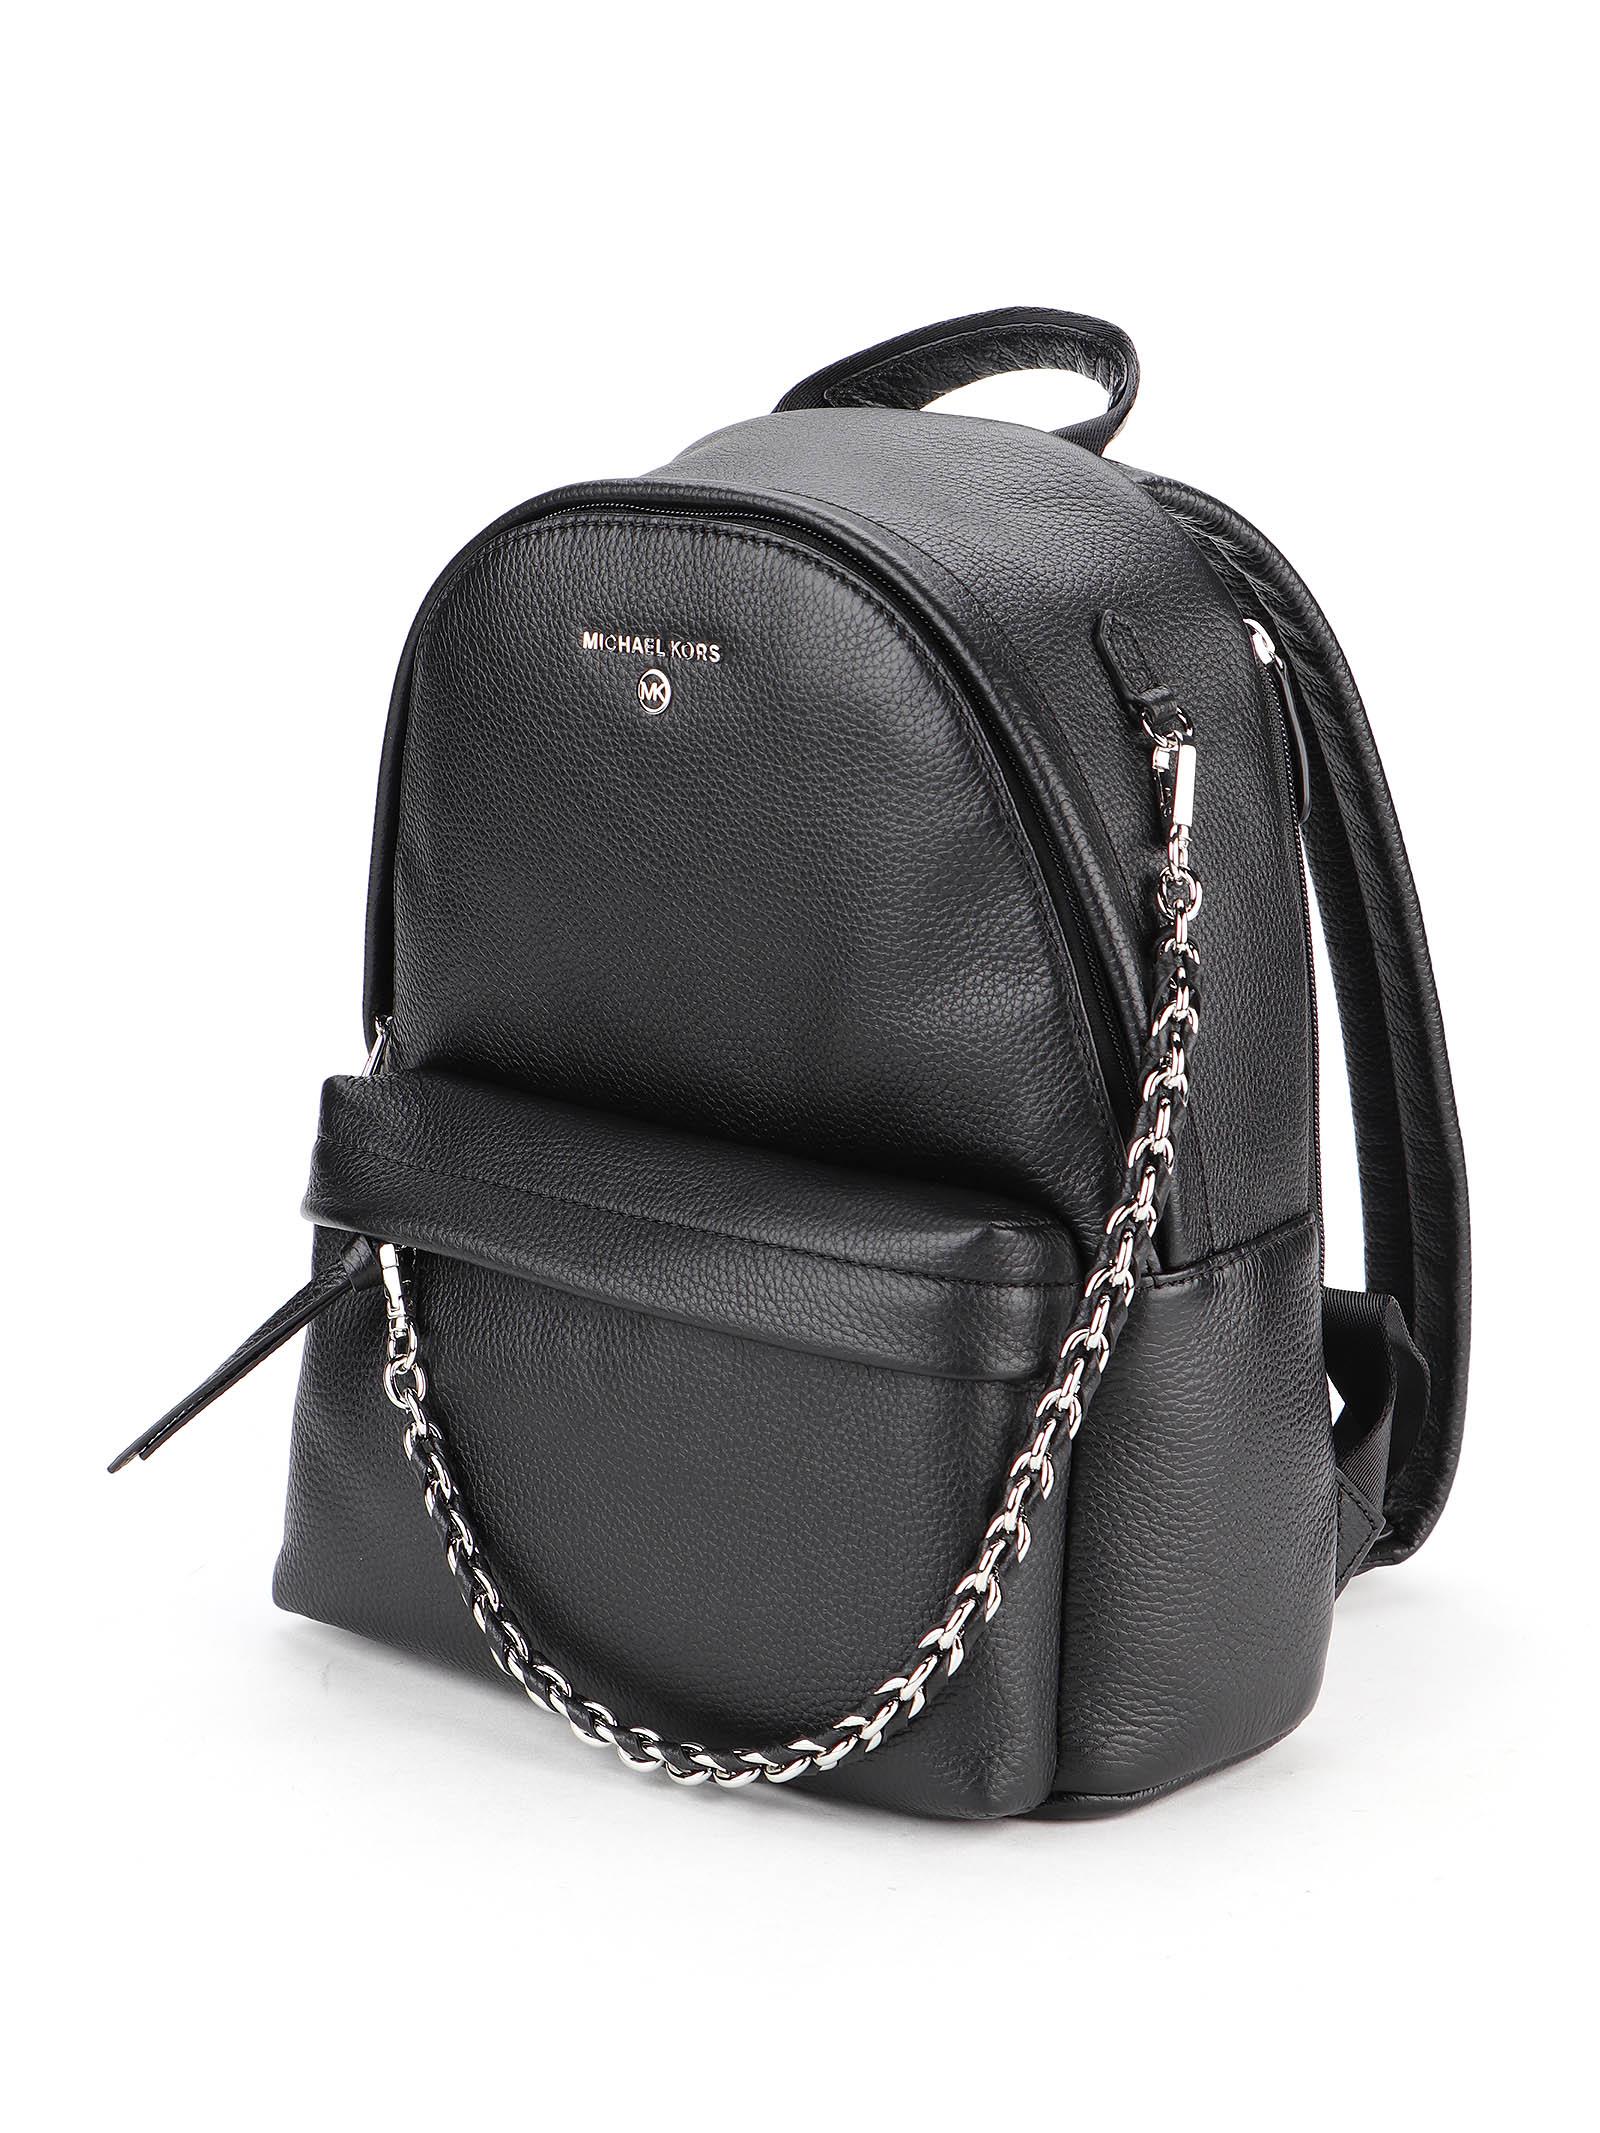 Immagine di Michael Kors | Slater Md Backpack